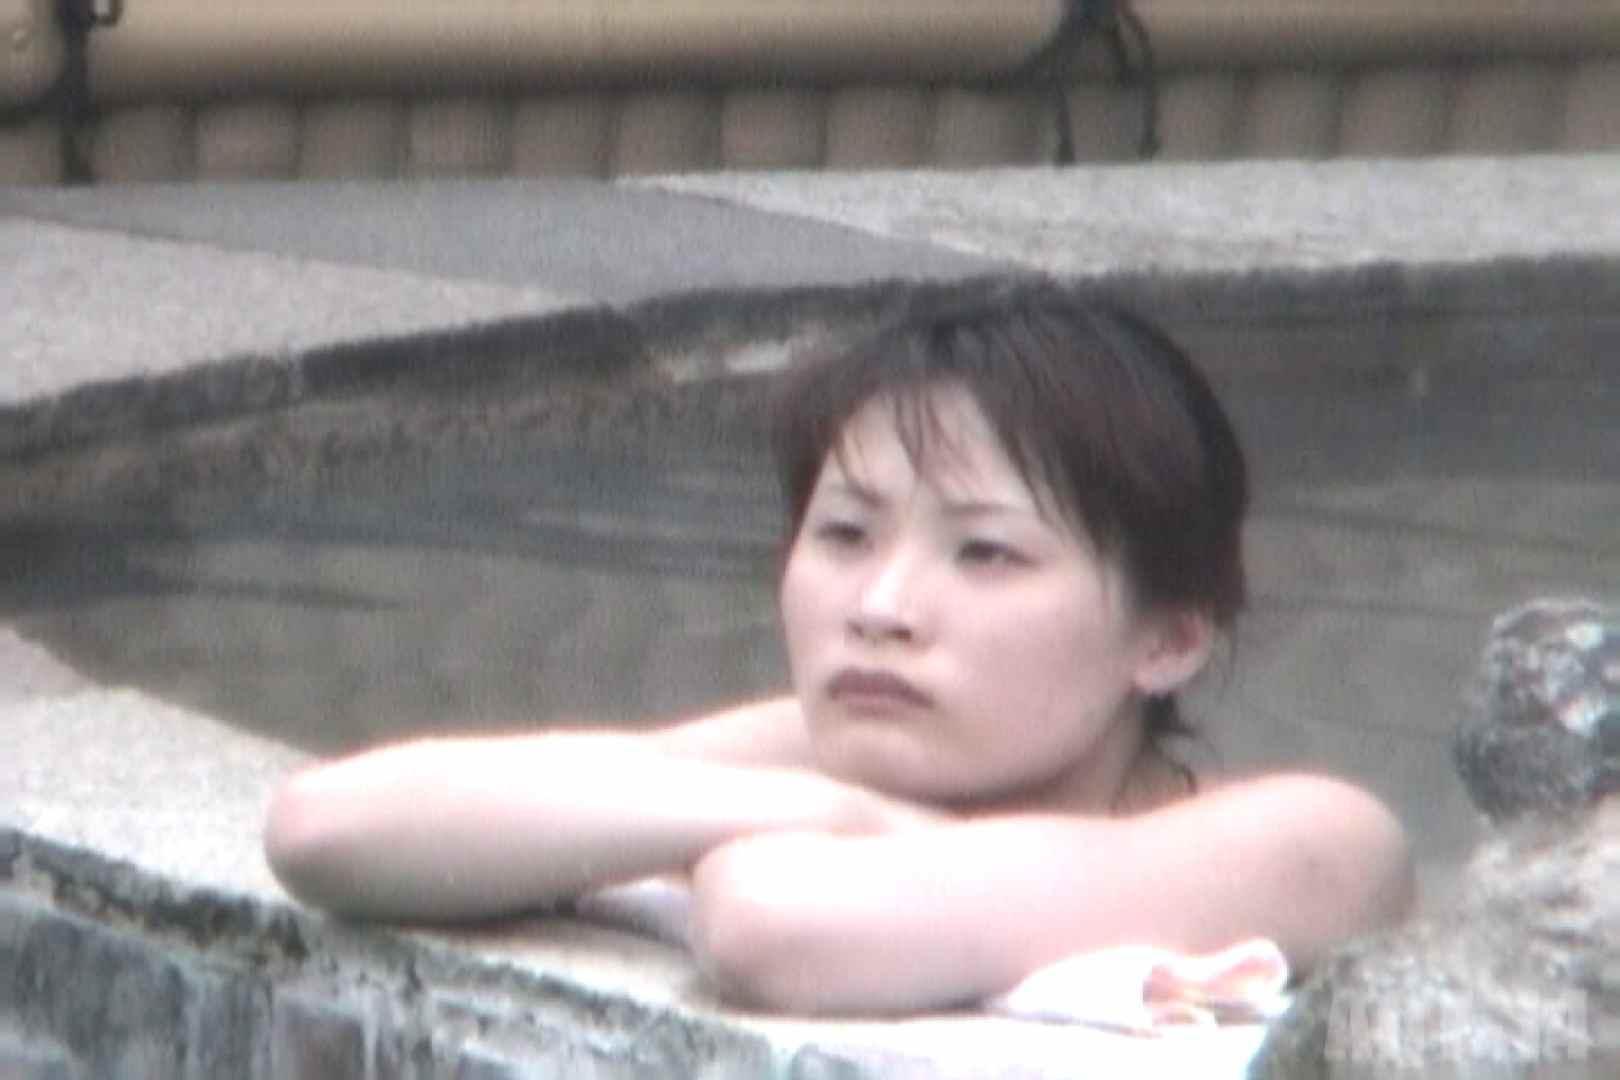 Aquaな露天風呂Vol.822 盗撮シリーズ | 露天風呂編  78PIX 21